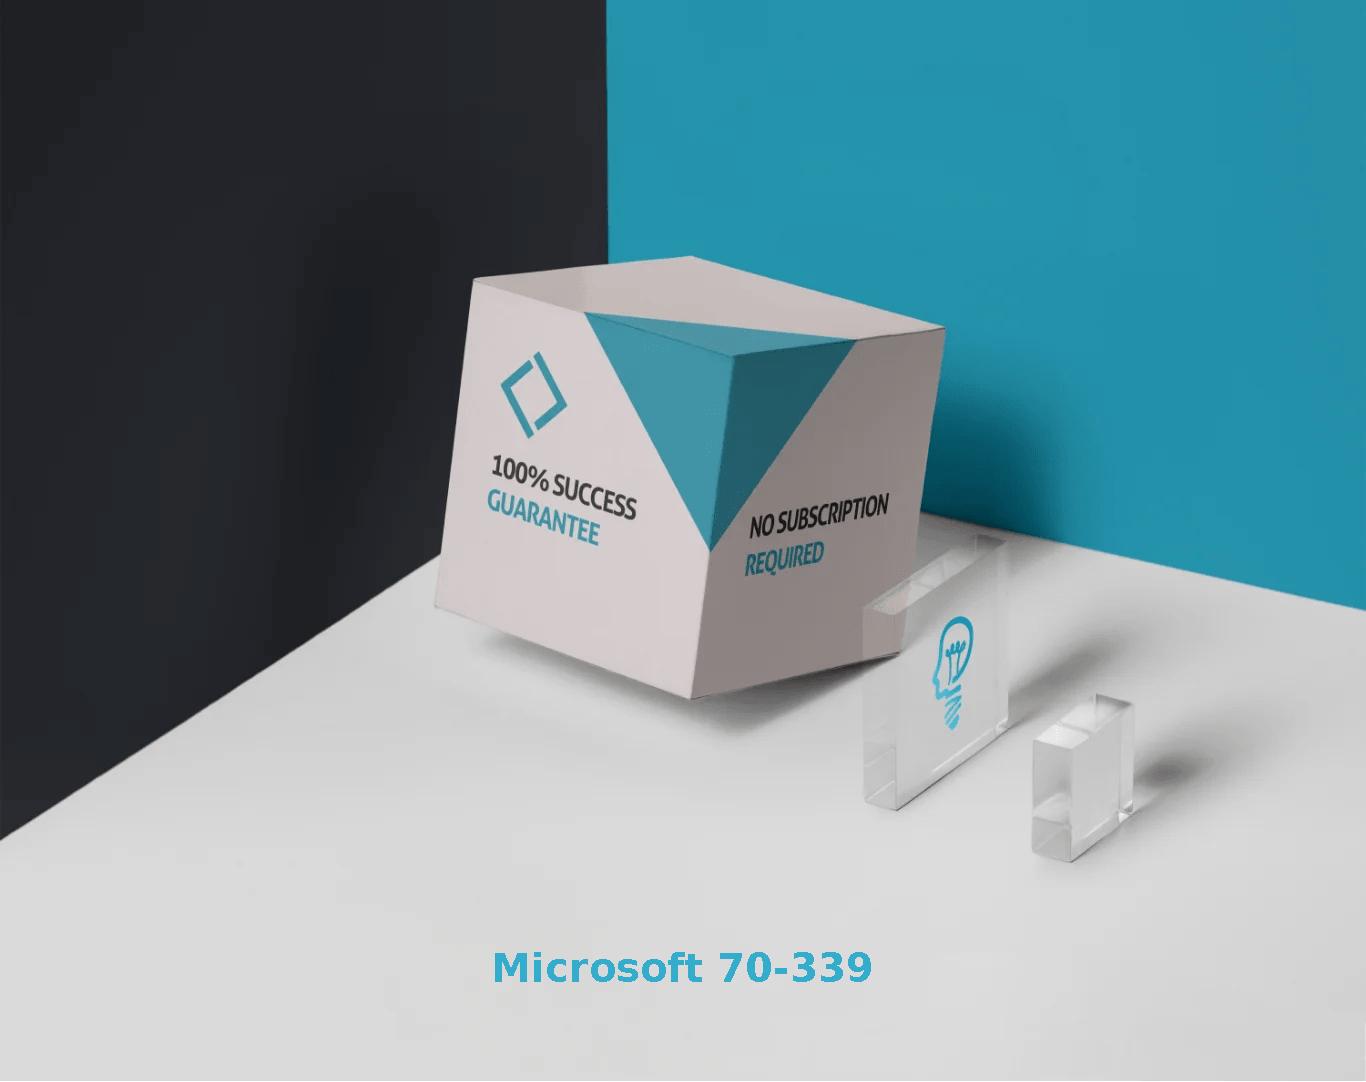 Microsoft 70-339 Exams